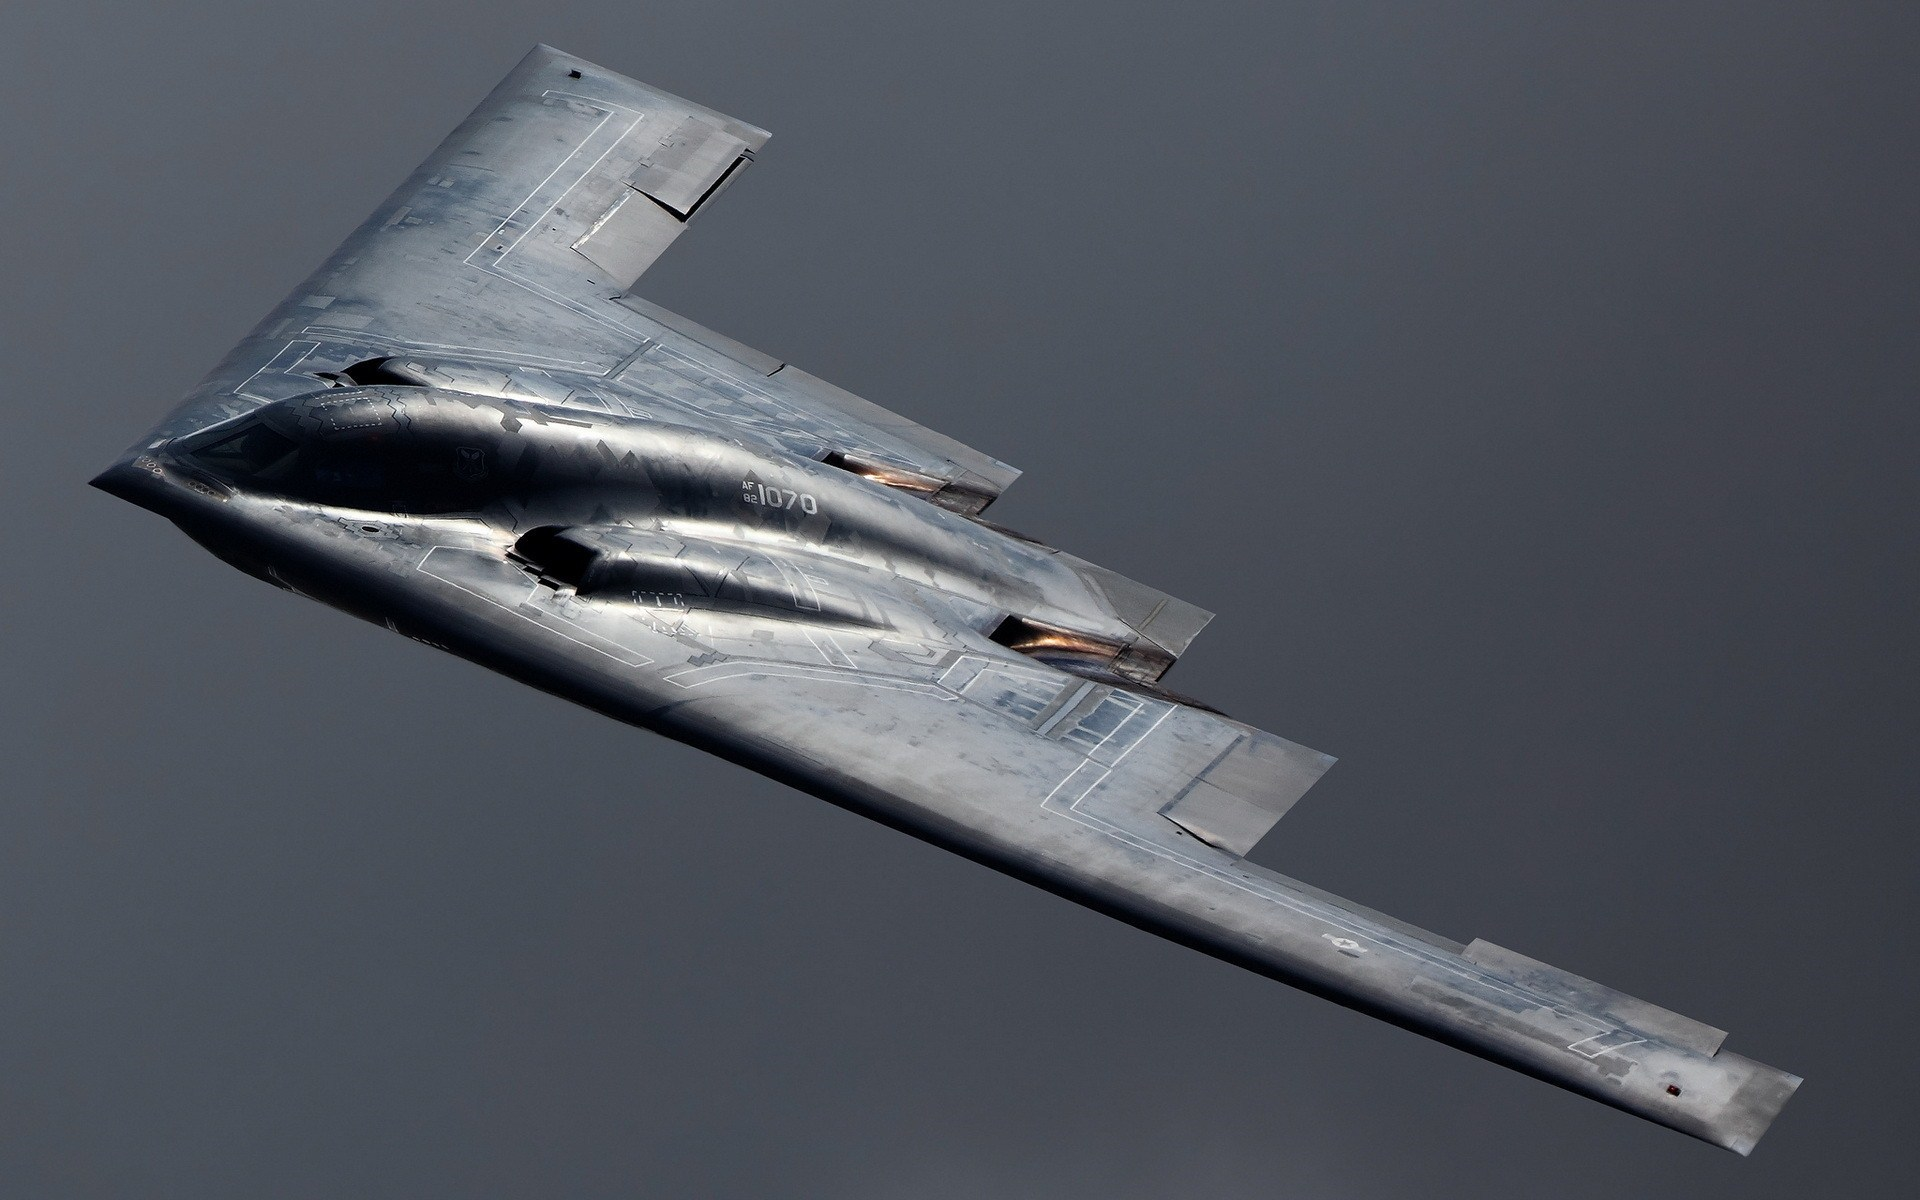 Northrop Grumman B-2 Stealth Bomber Military Aircraft